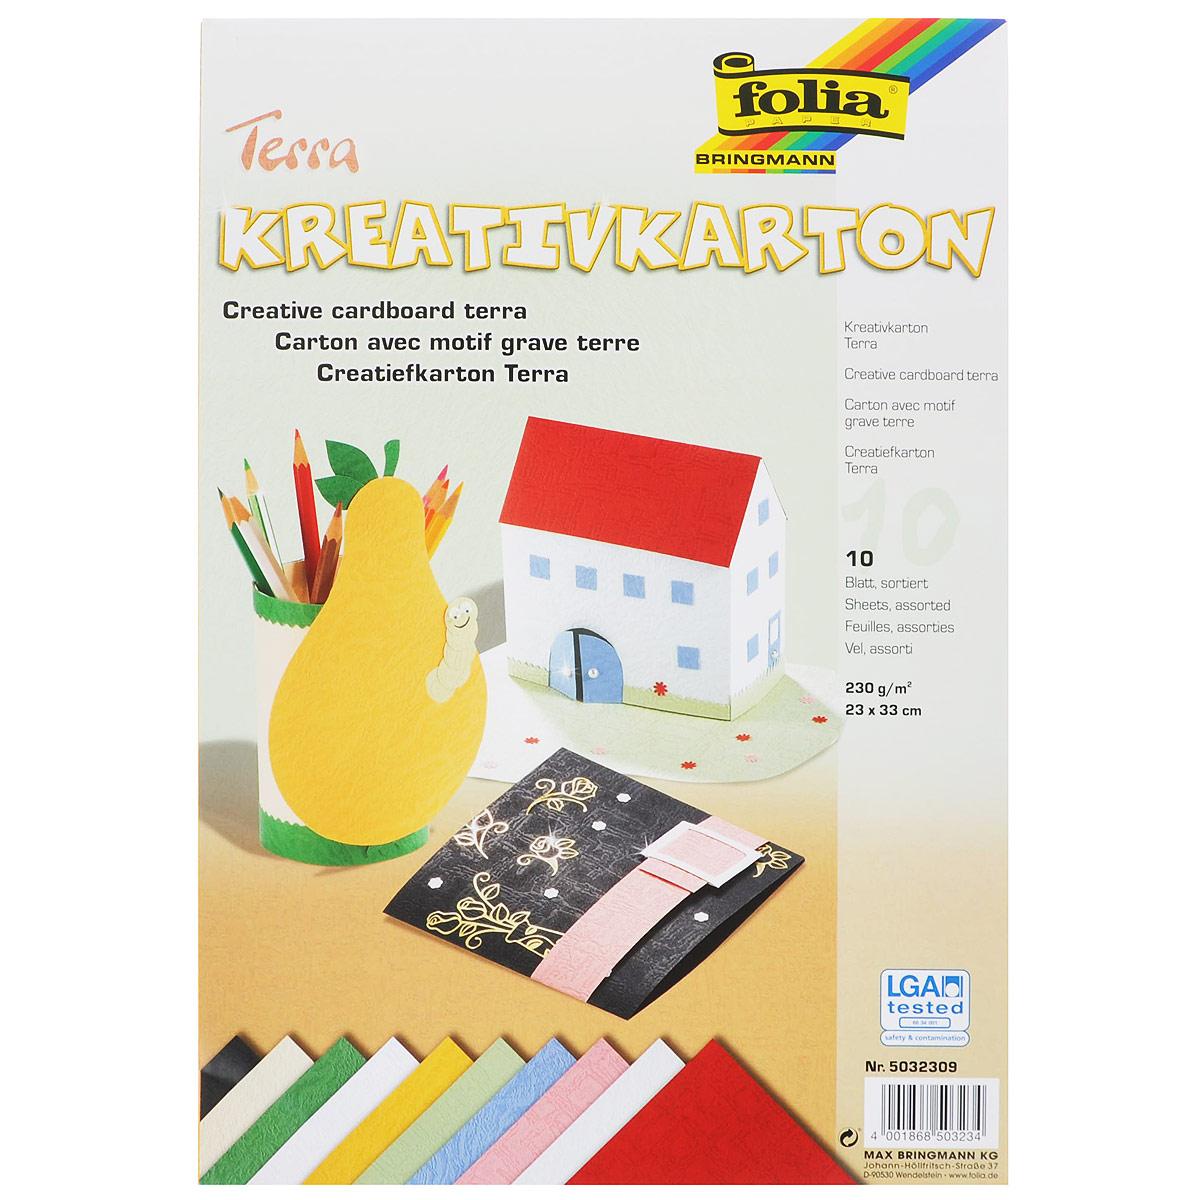 Картон текстурированный Folia Terra, 23 x 33 см, 10 листов аксессуар marsmd goliath 3 кгц 7 5 кгц для x terra катушка